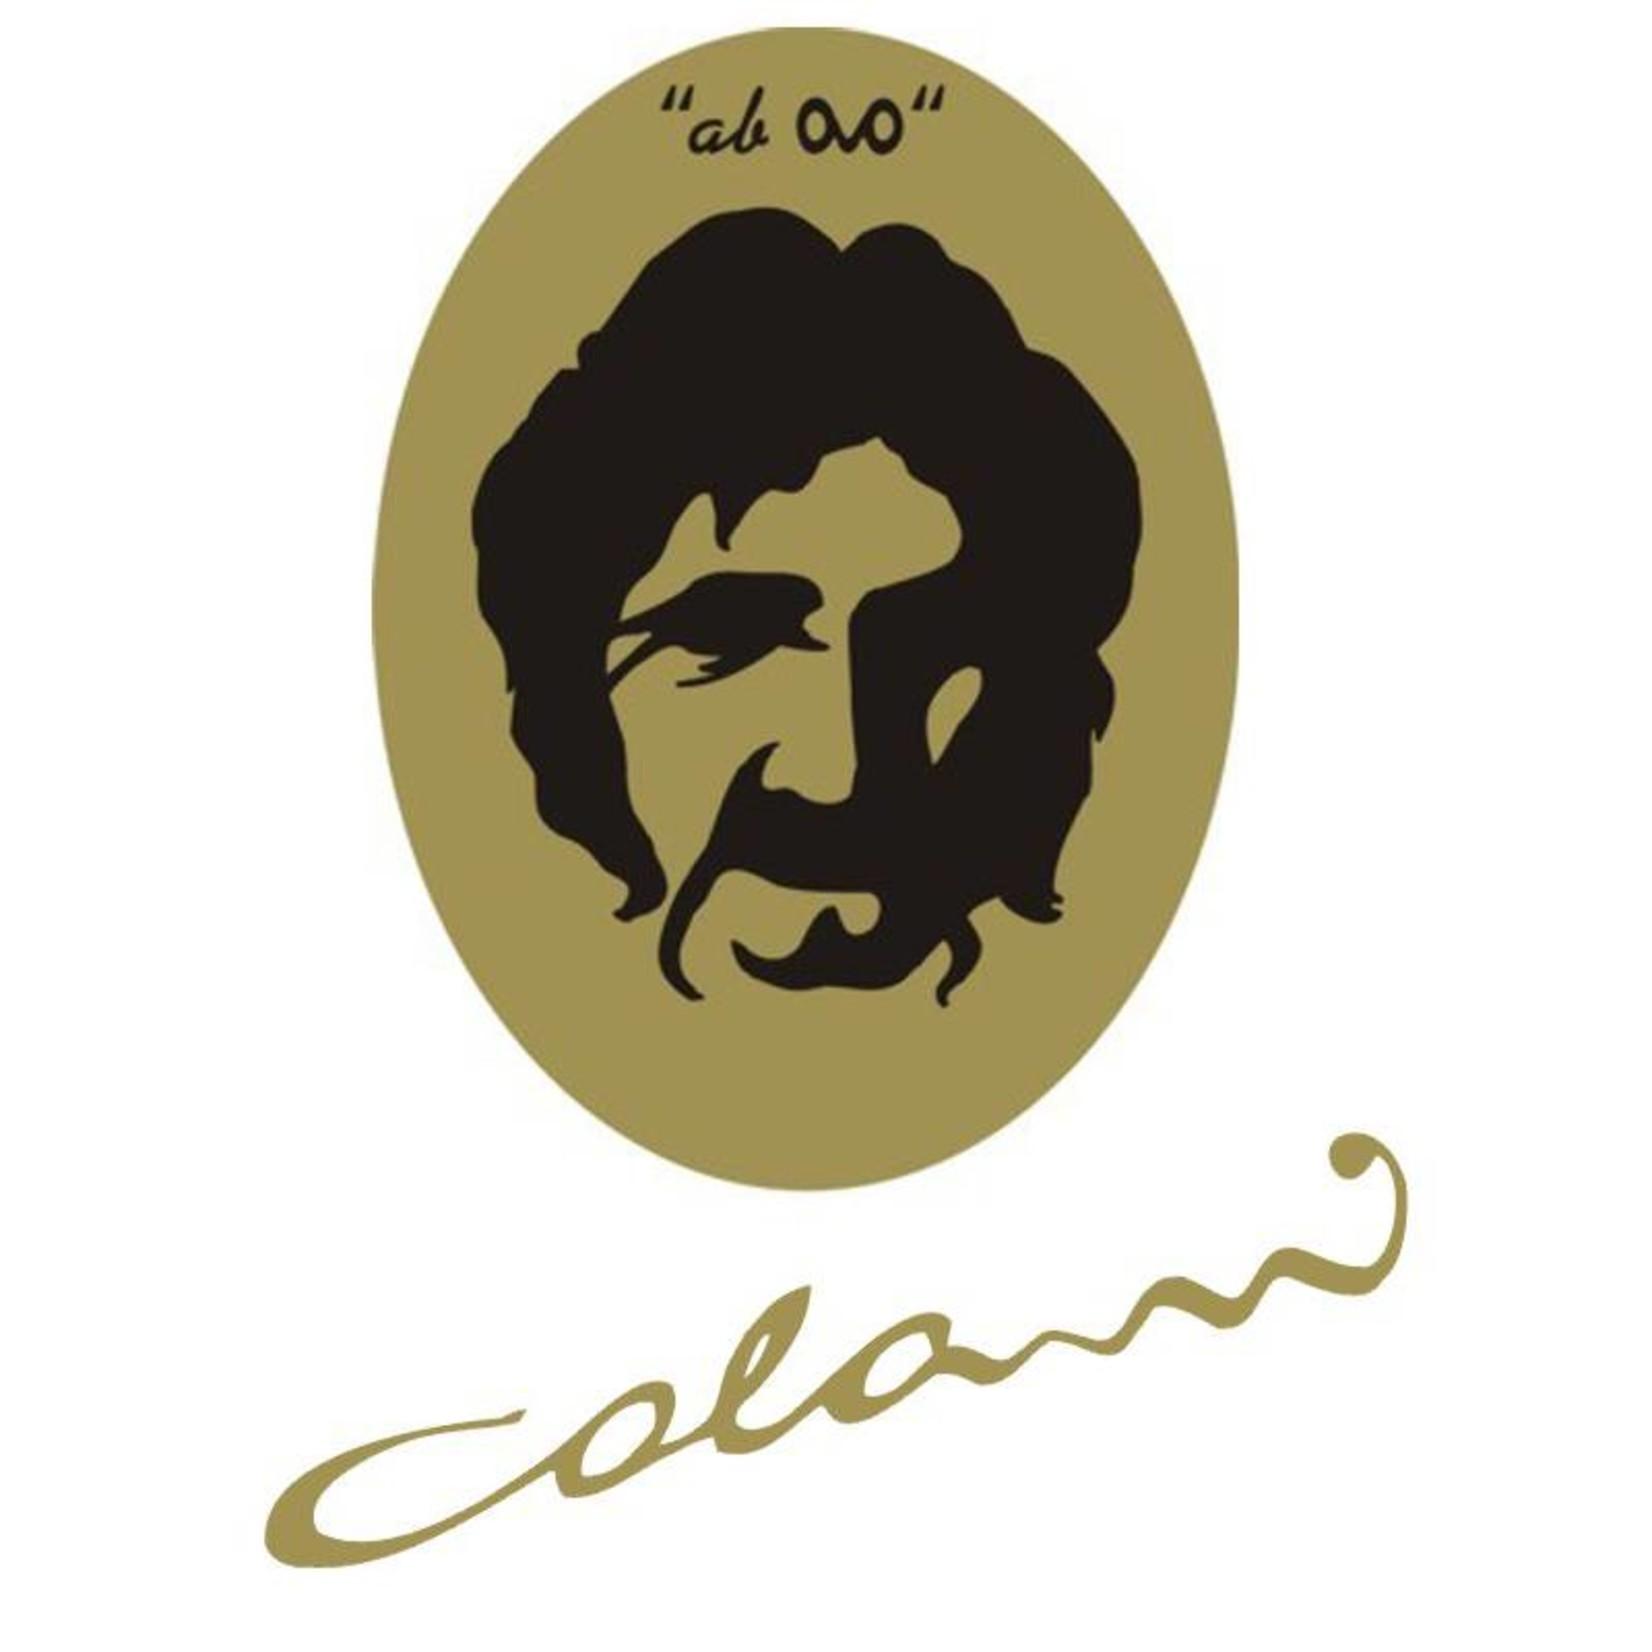 Colani Porzellanserie Colani Kaffee-/Cappuccinotasse | Tasse inkl. Unterteller | orange